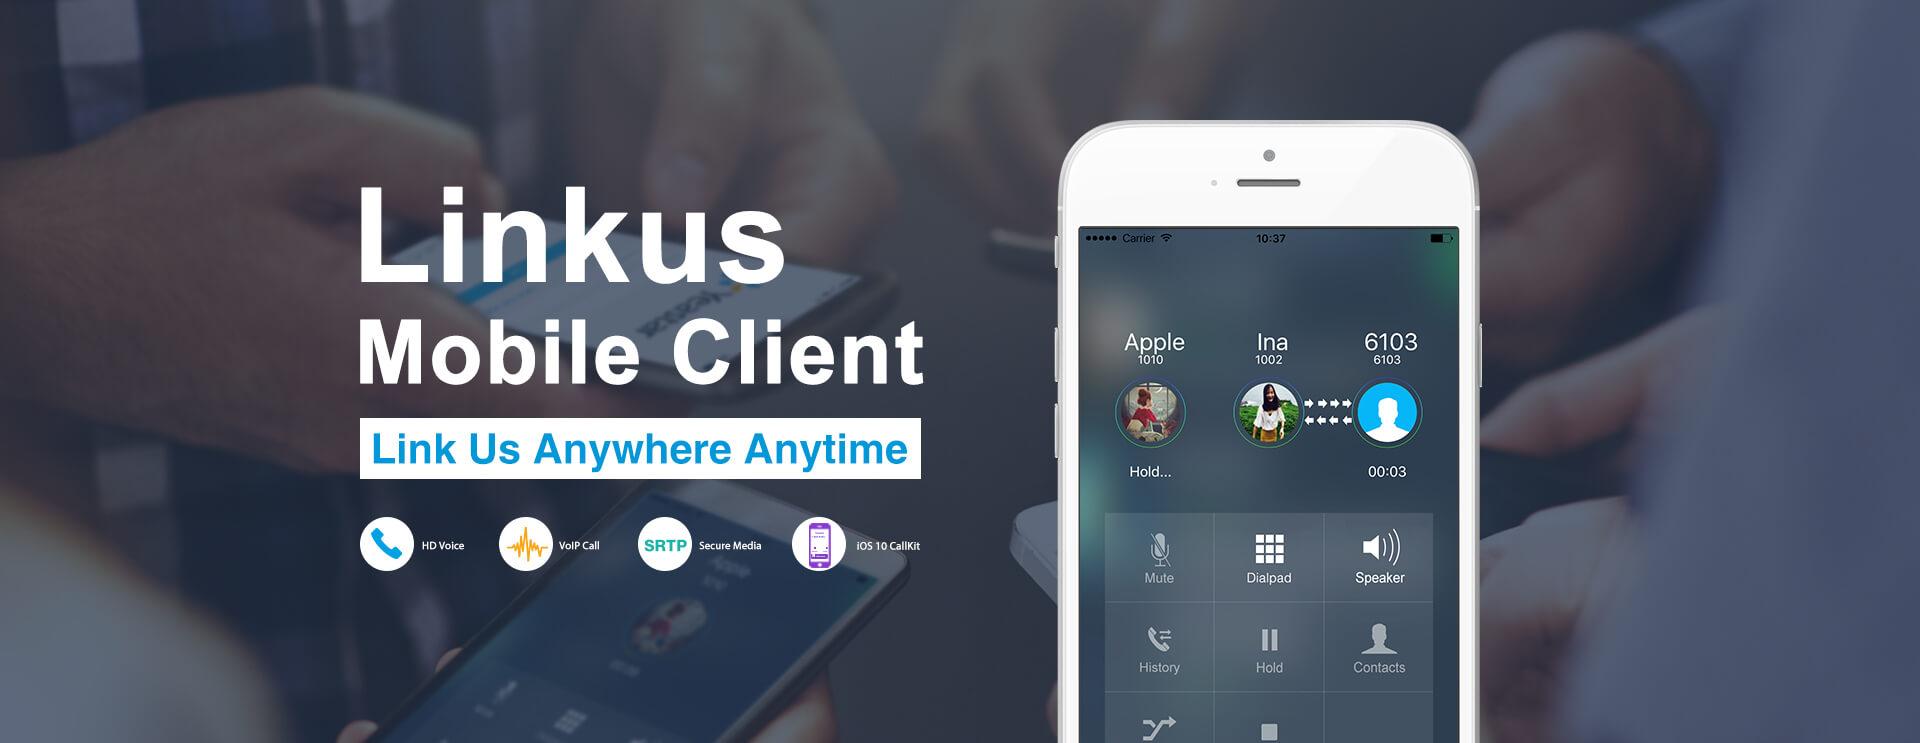 Linkus-mobile-client-banner